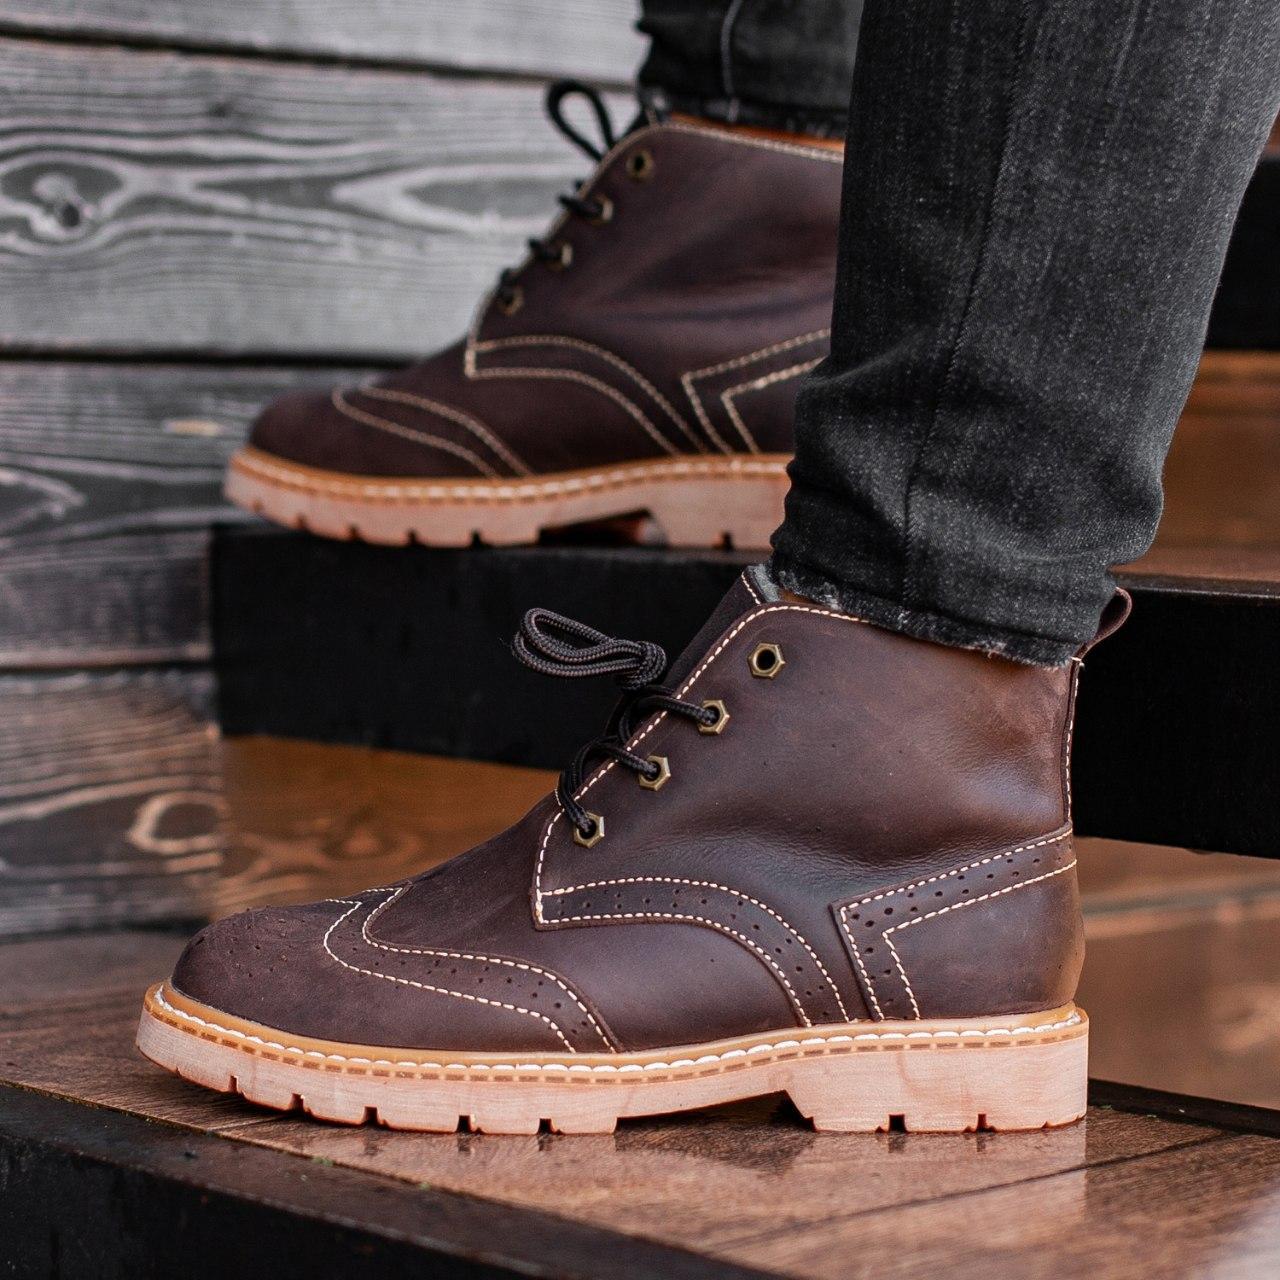 Ботинки South Rebel brown - фото 1